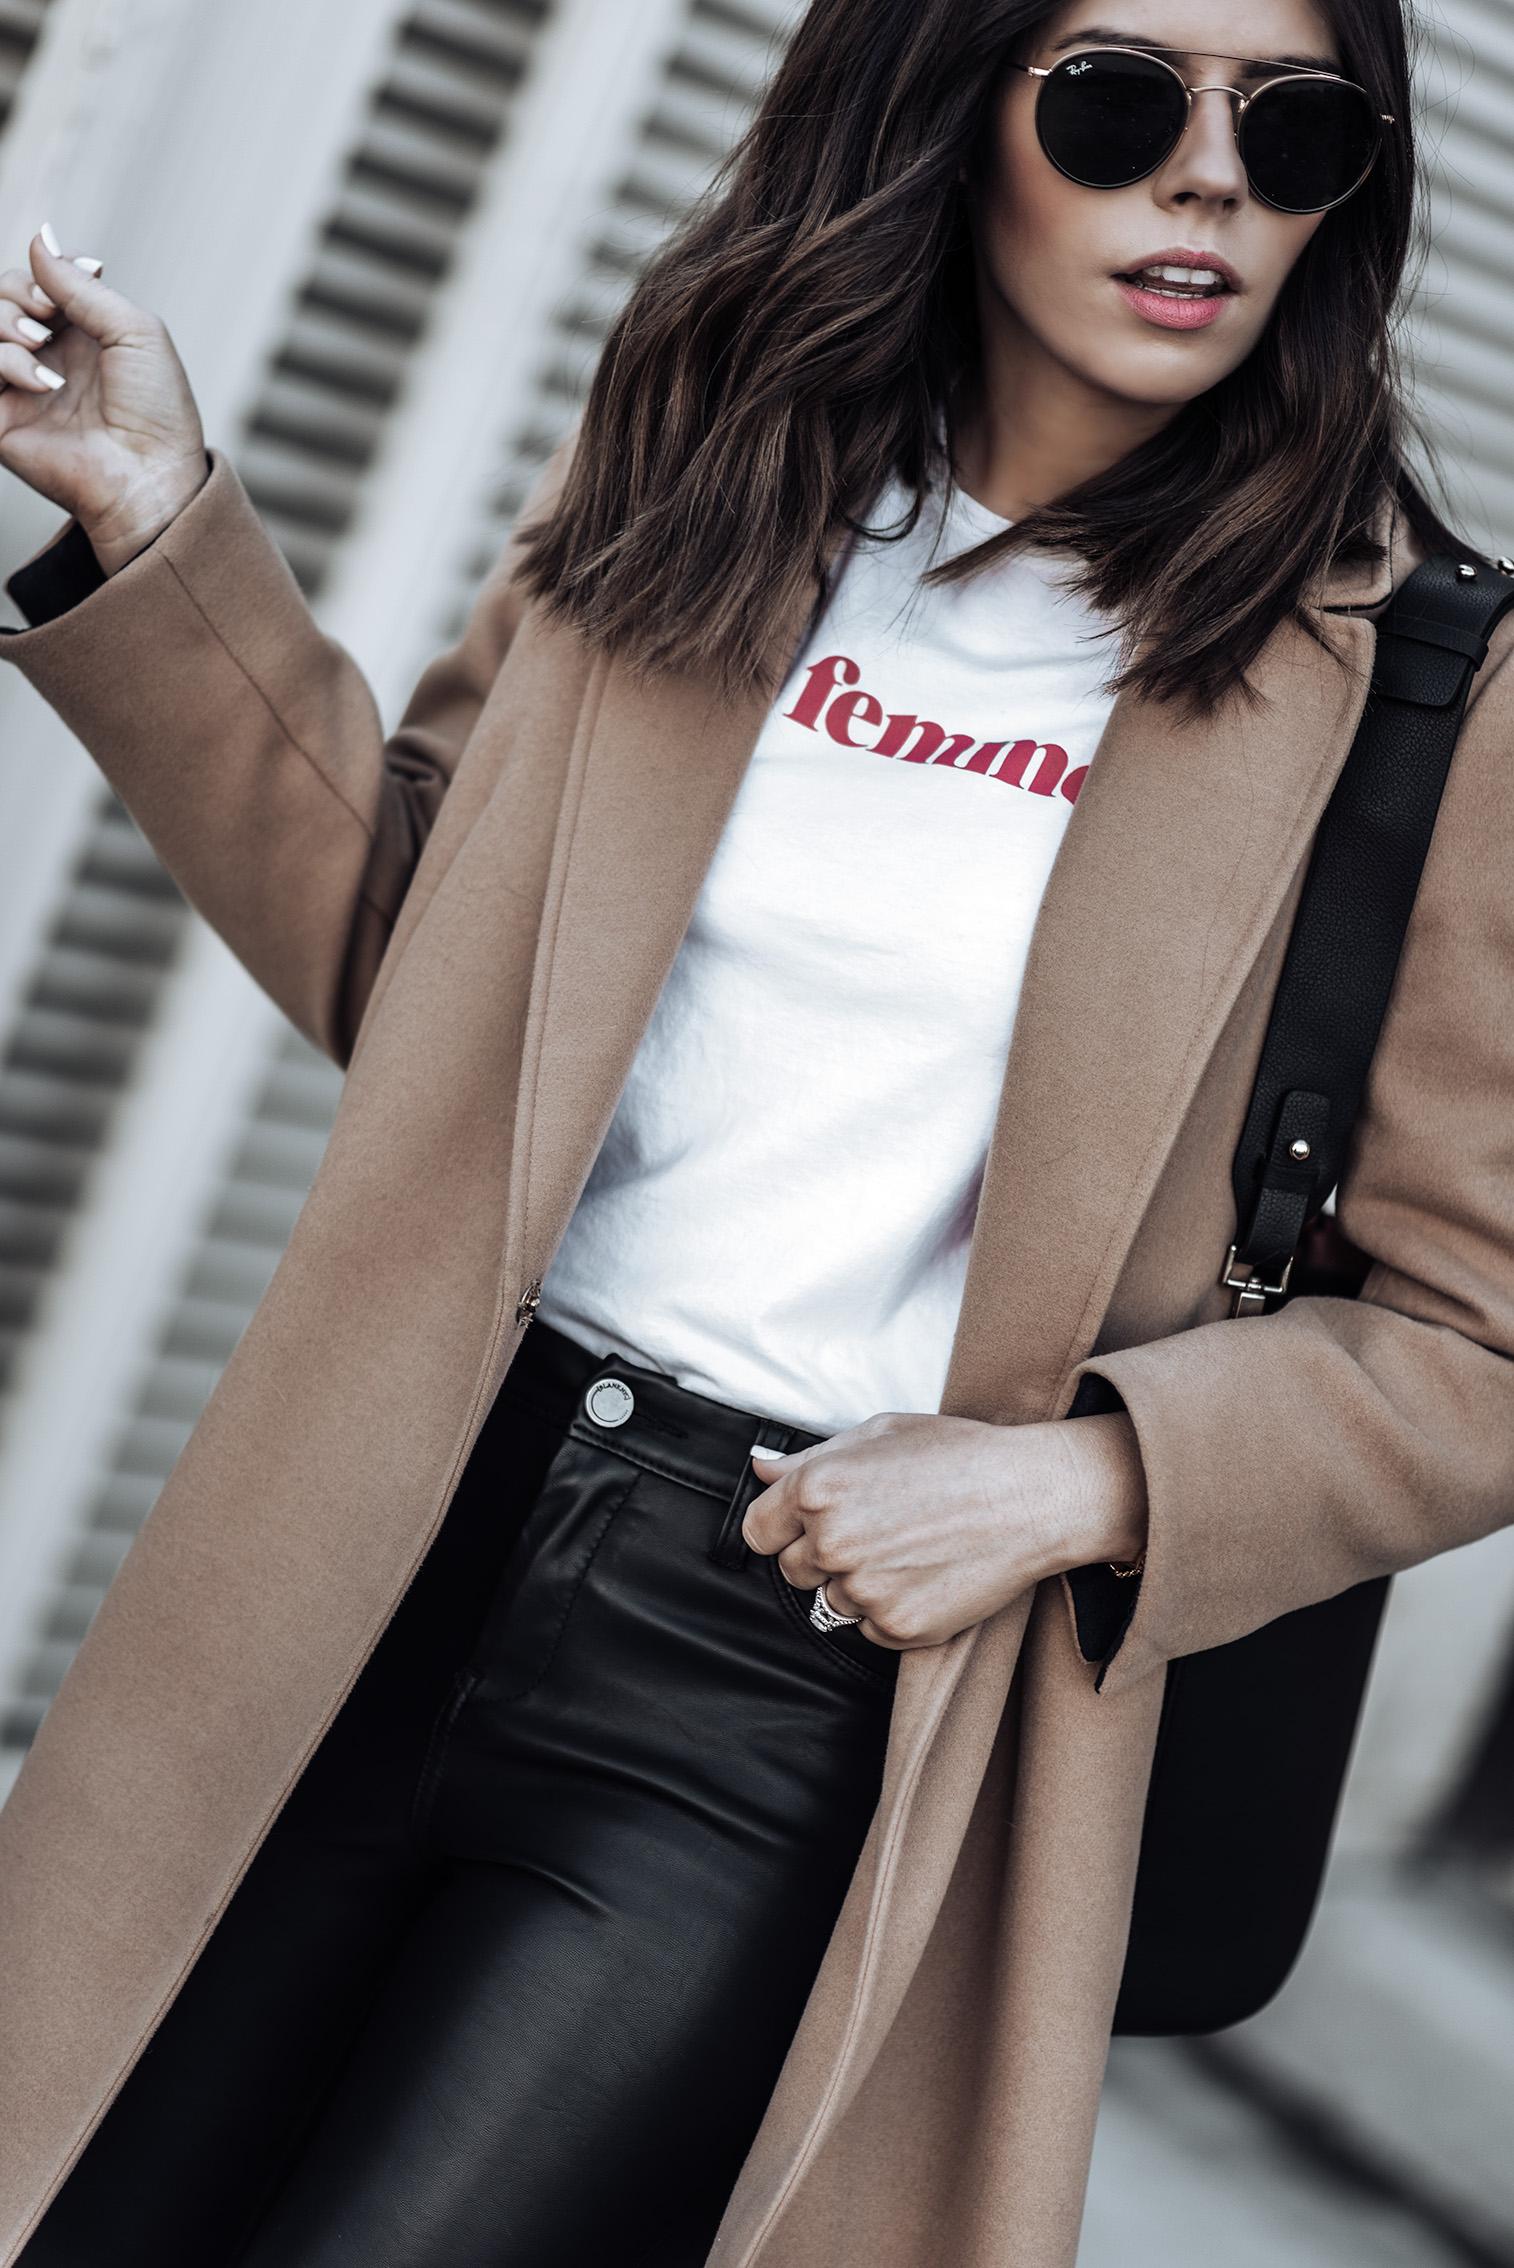 Camel coat via Topshop (similar here) | {C/O}Greats Sneakers (similar) | The principle mid rise vegan leather pant via Shopbop | Sezane La Femme Tee | Topshop bucket bag (similar)